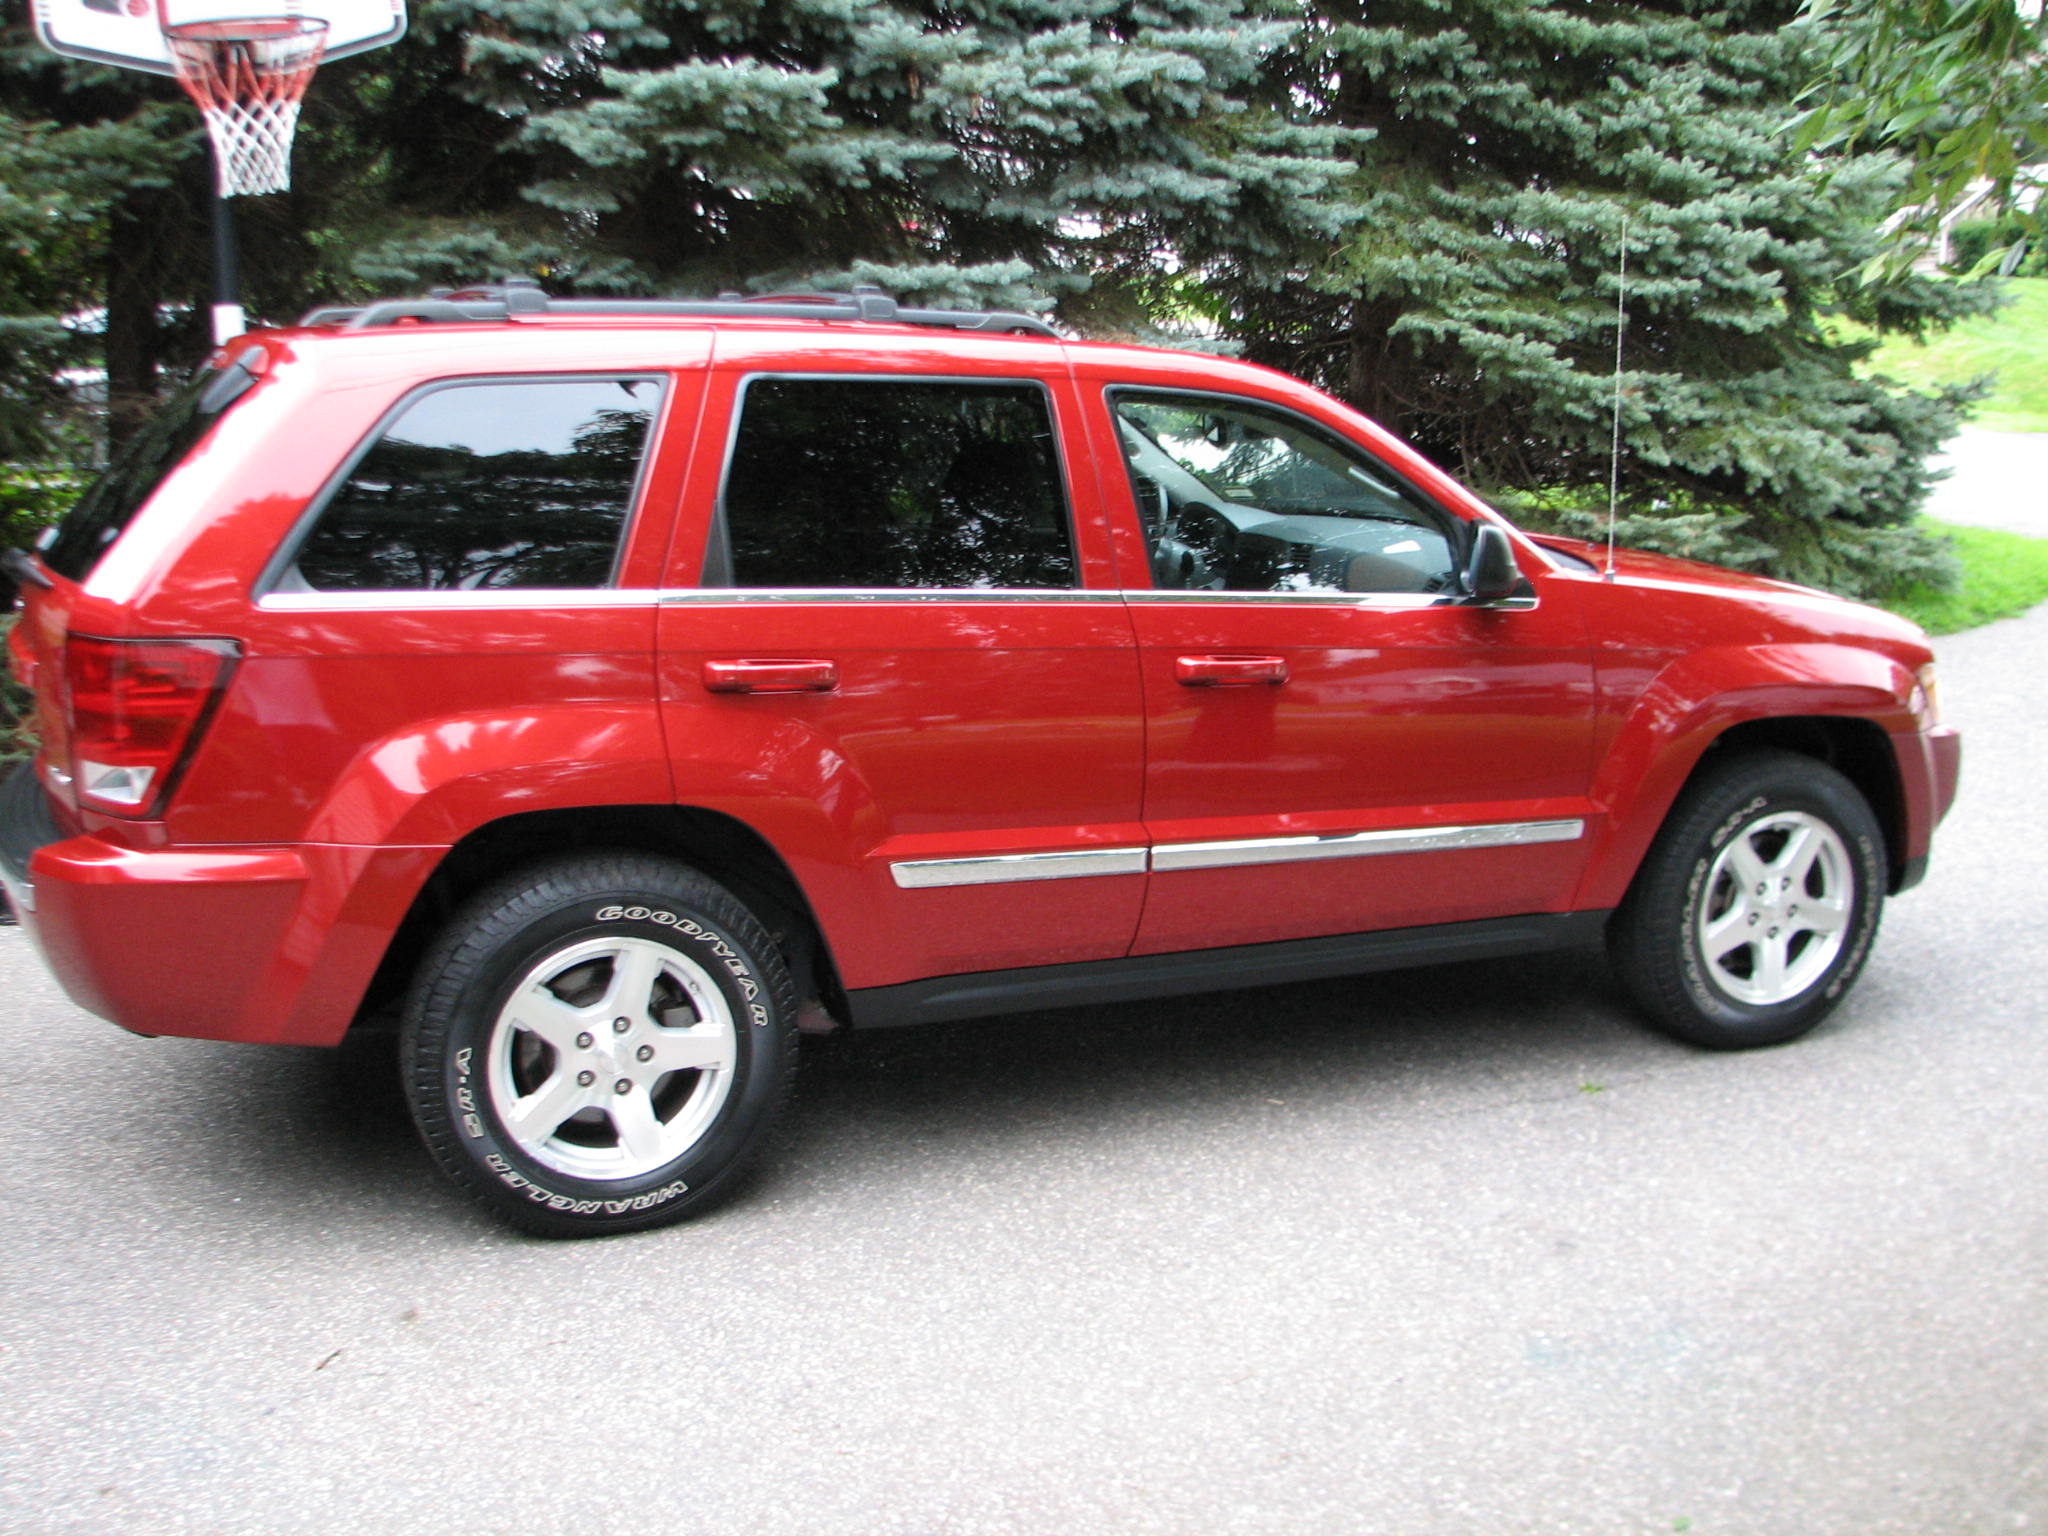 wolfgang-car-detailing-moms-jeep-8-9-09-009.jpg